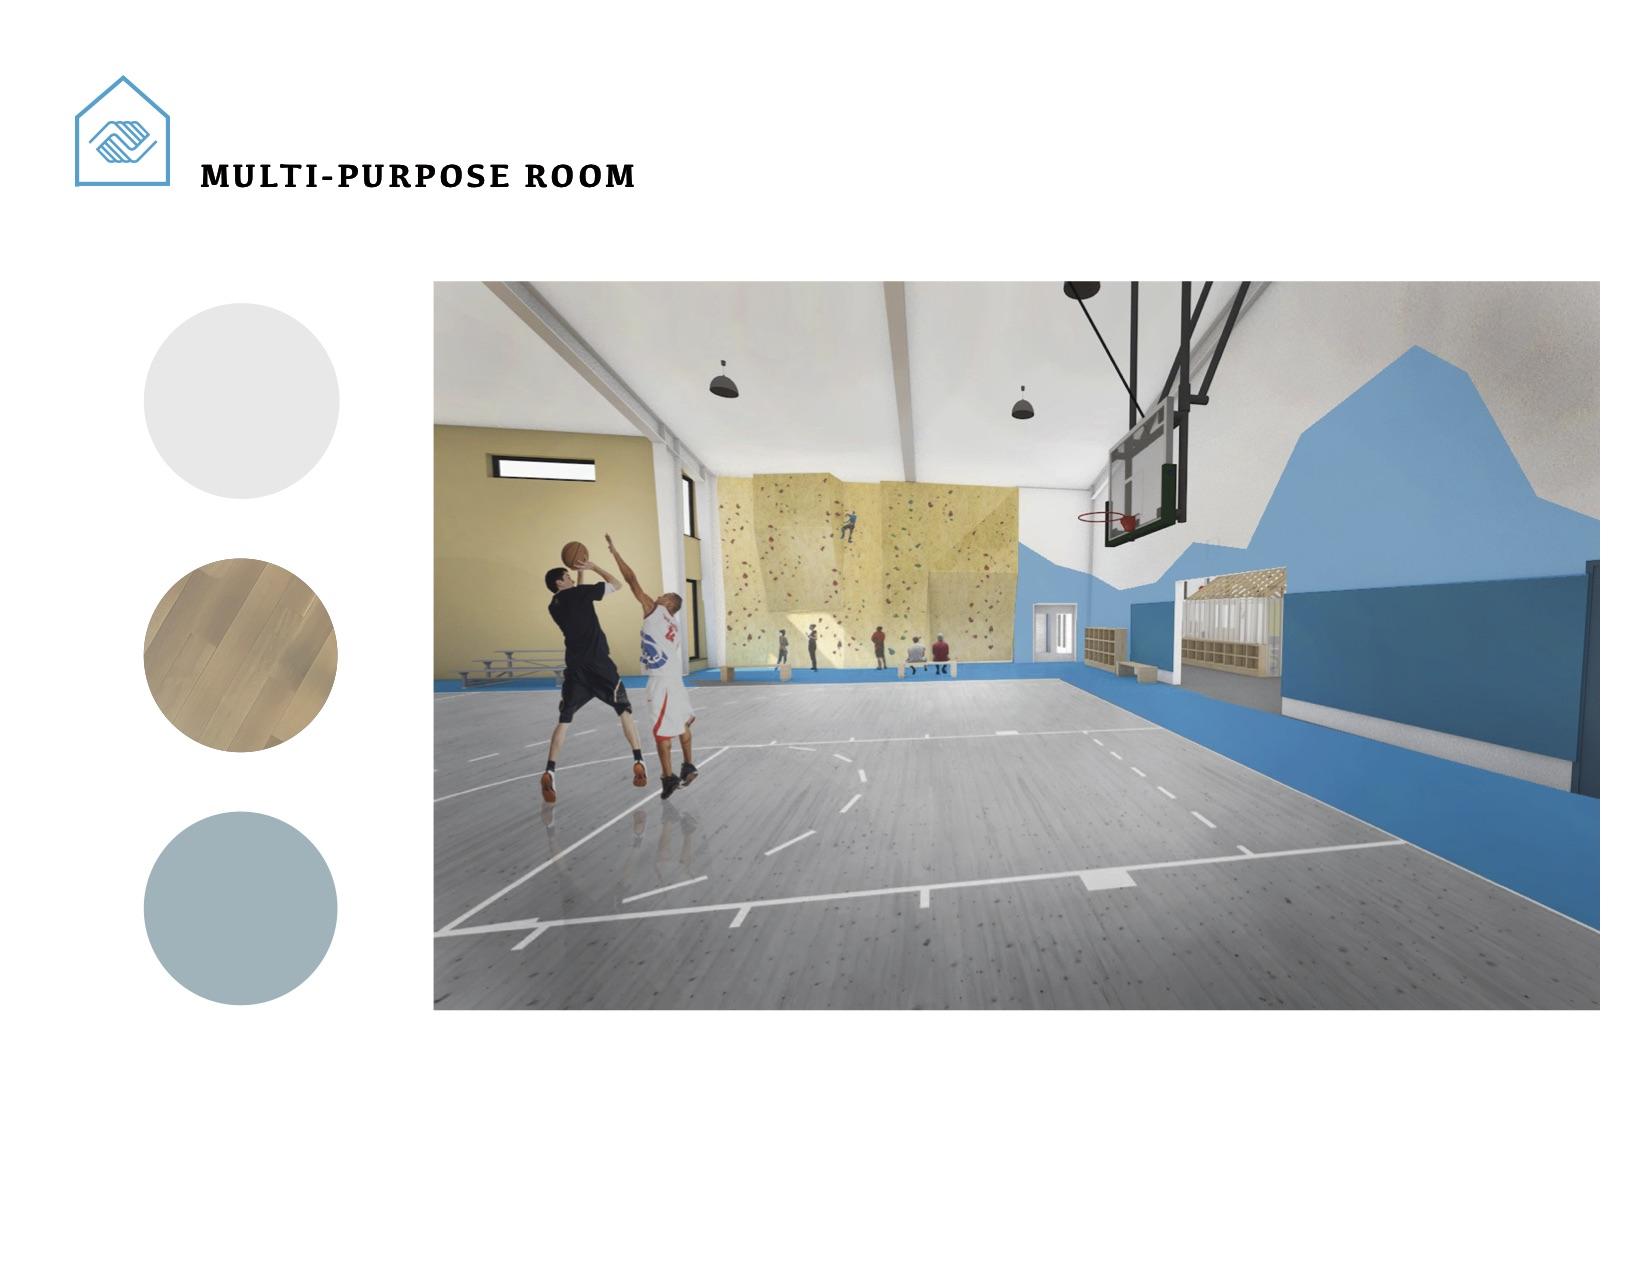 Interior Design Presentation 0919163.jpg